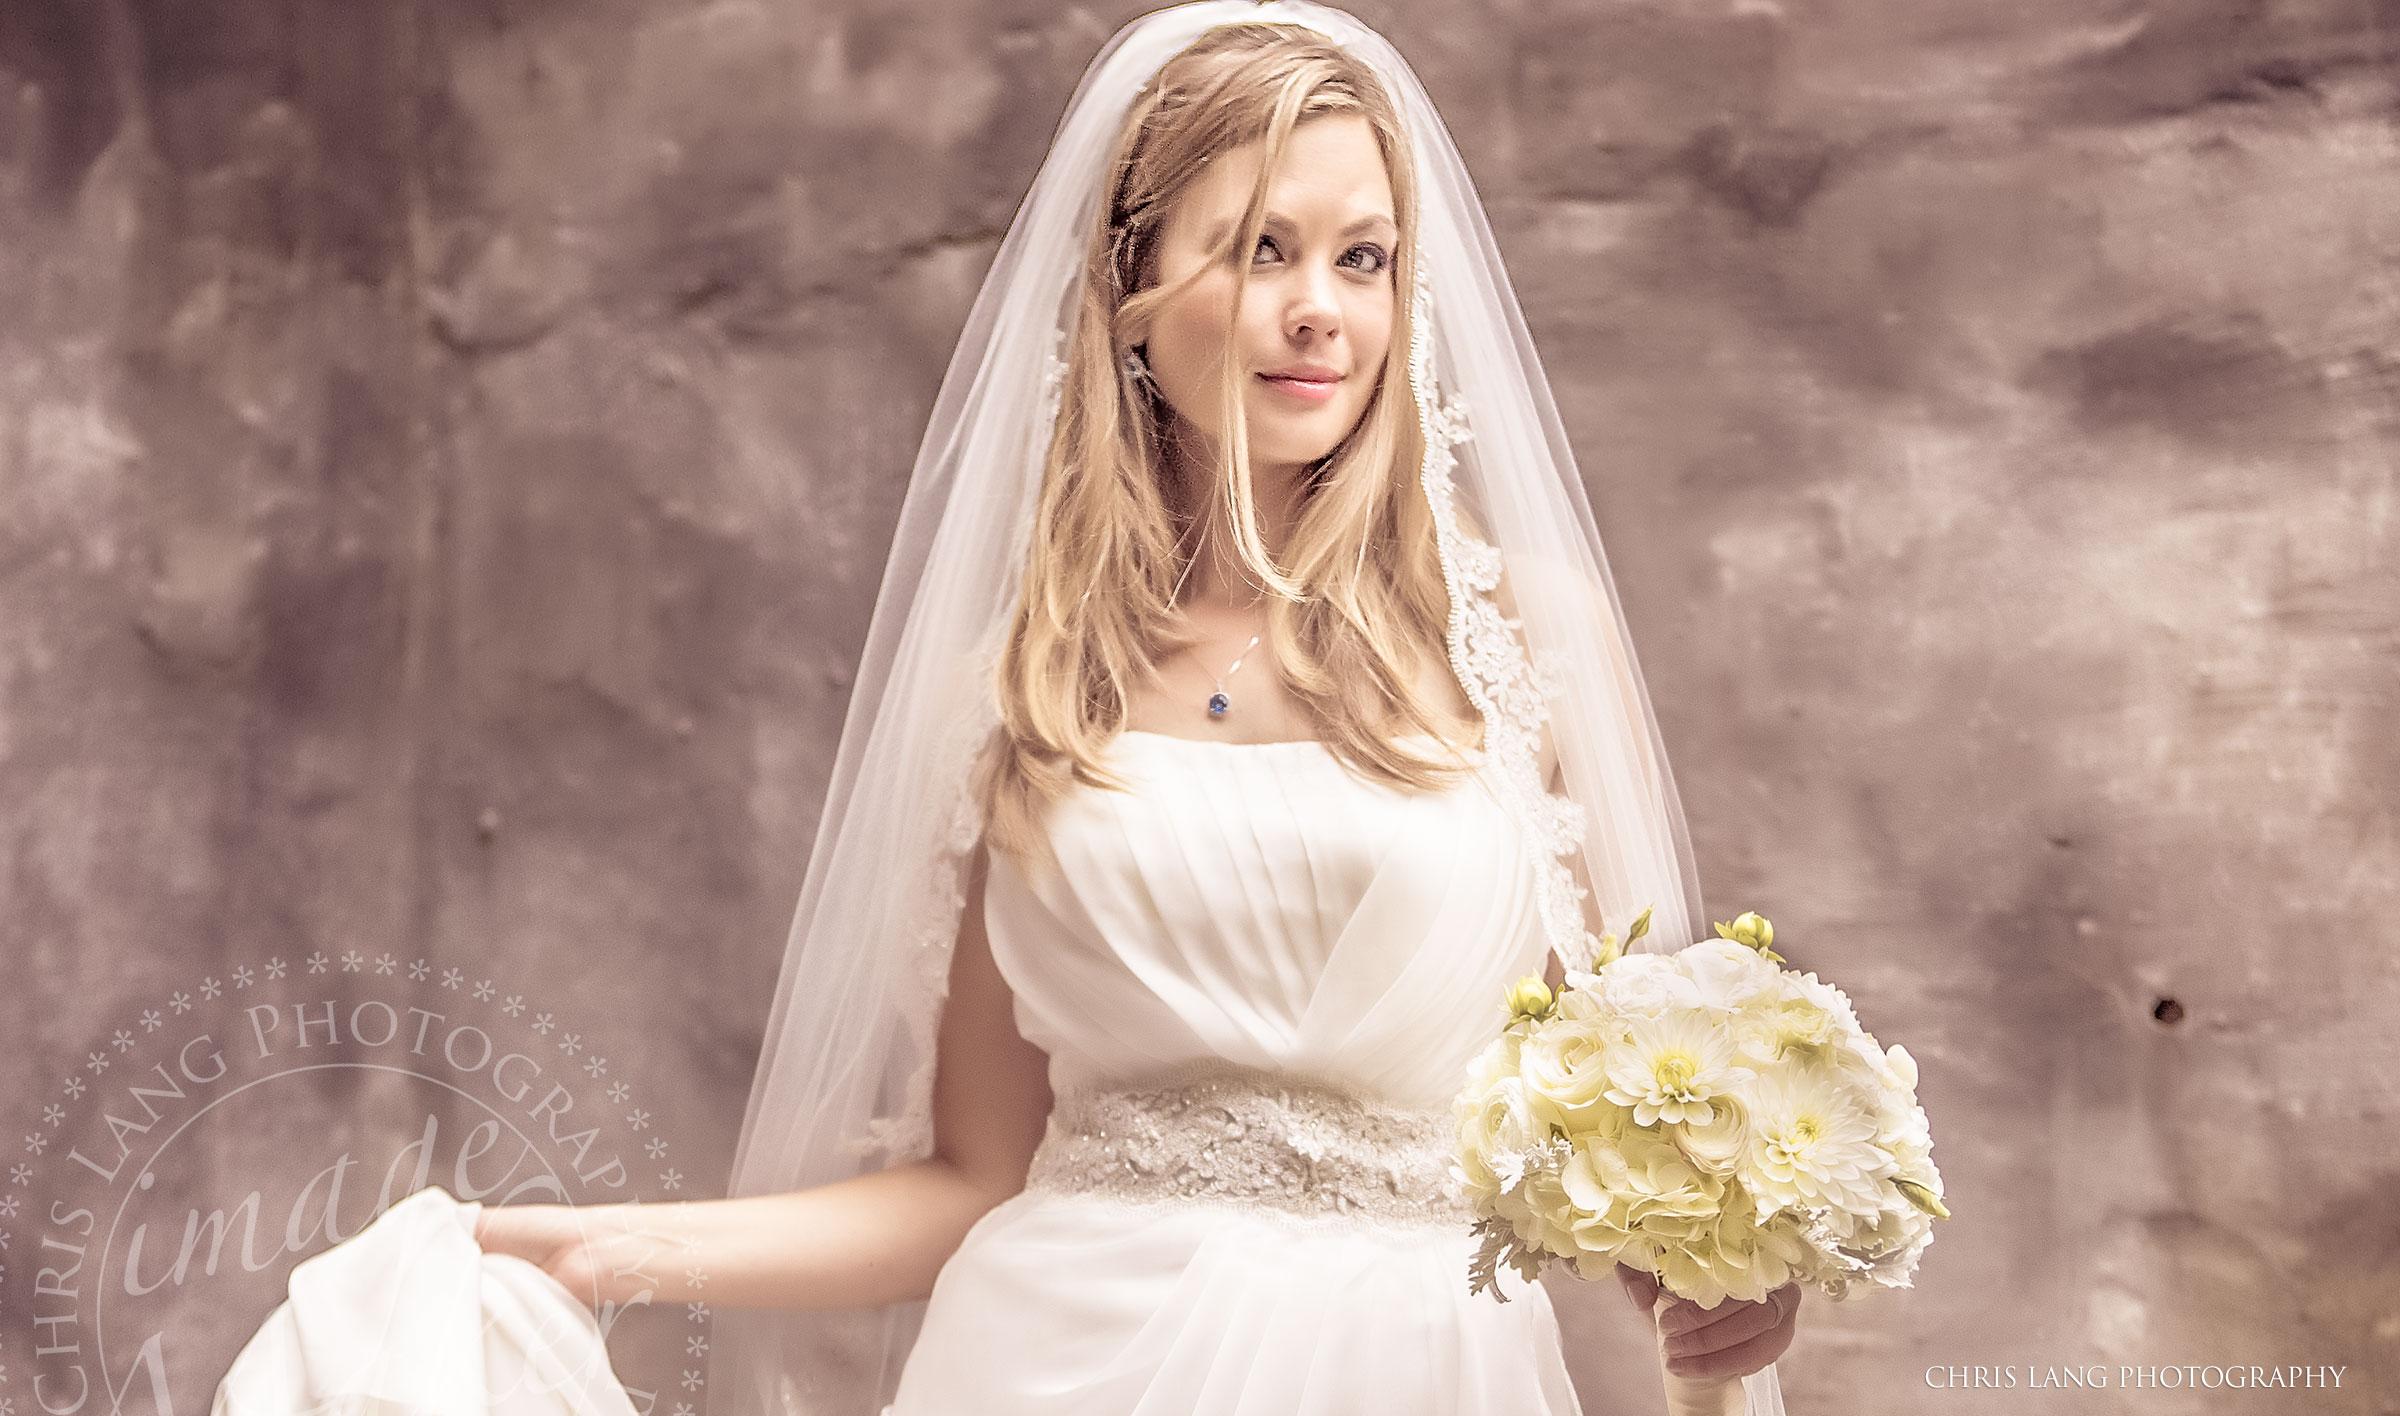 bridal portraits, bridals, wedding dress, wedding gown, bridal session, bridal photography